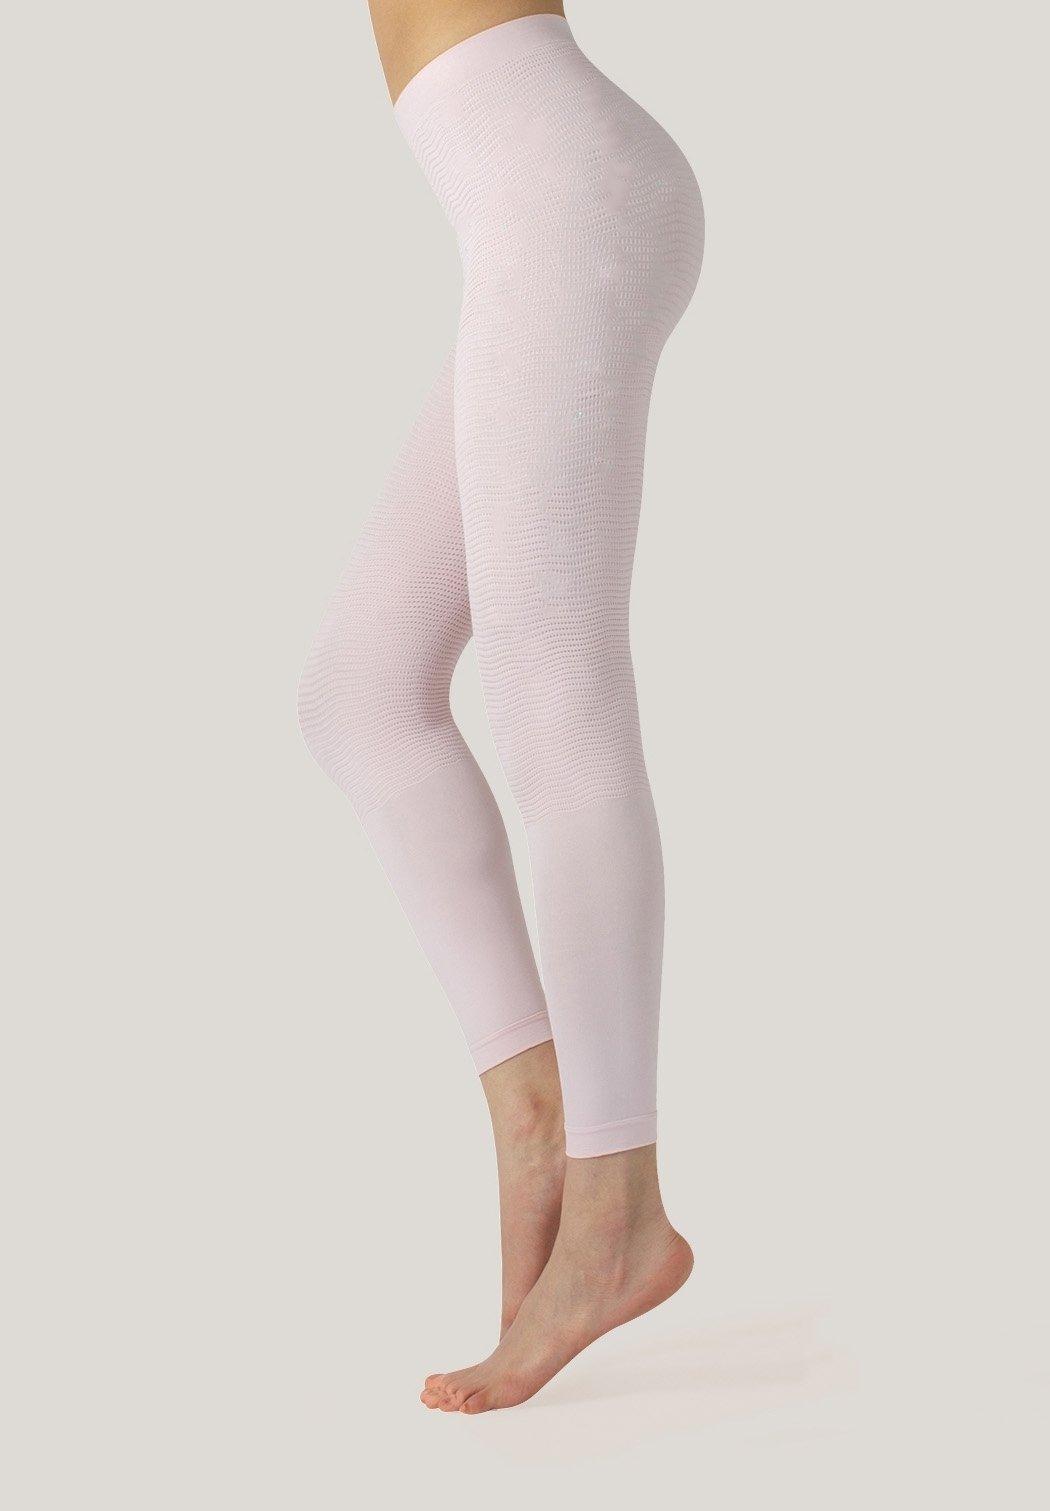 Donna ANTICELLULITE  - FIRM SKIN - Pantaloni del pigiama